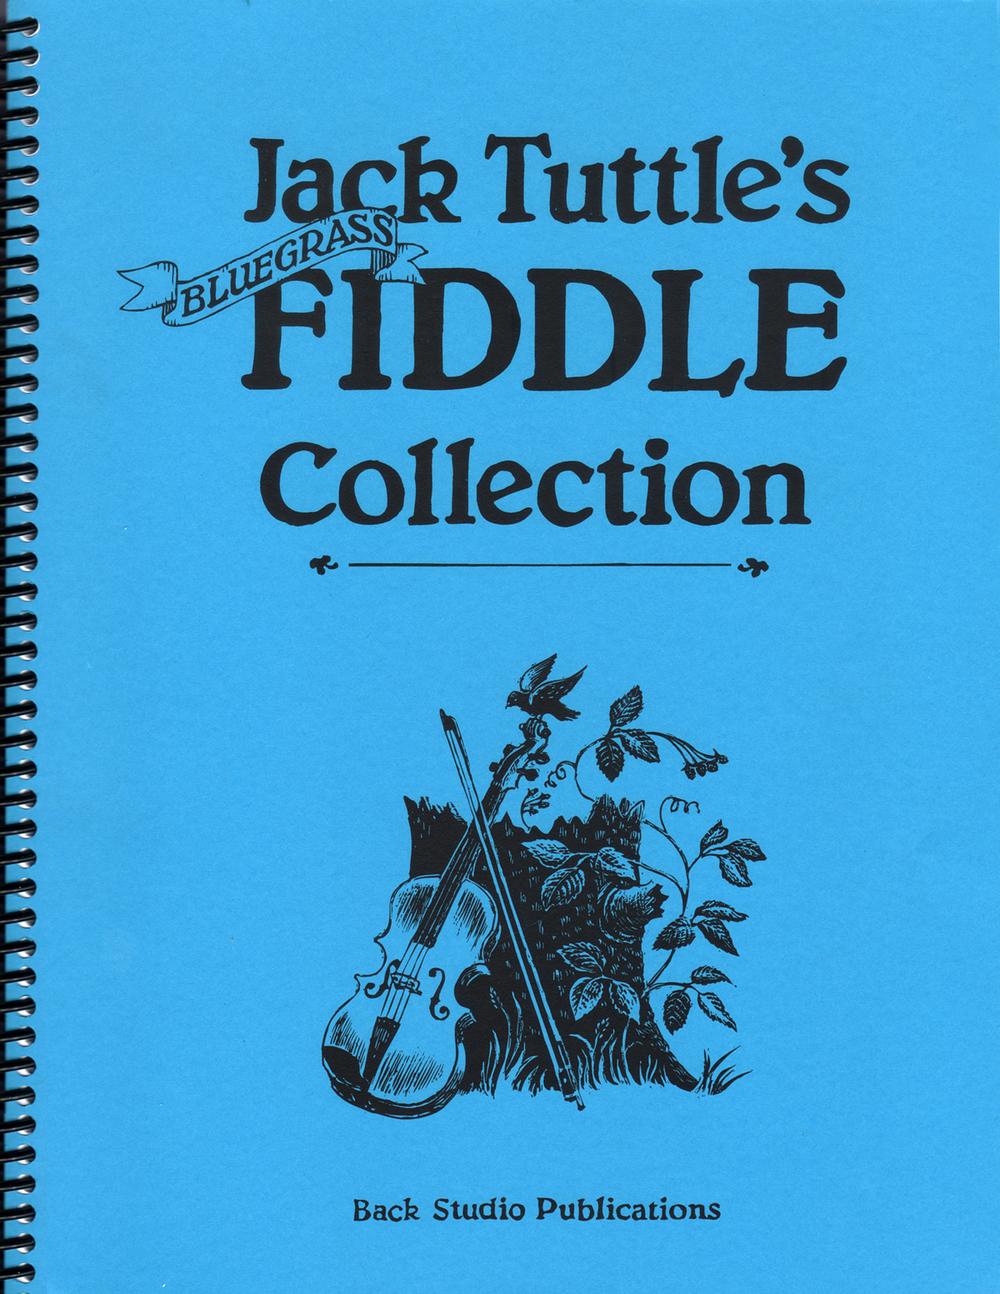 Jack Tuttle's Bluegrass Fiddle Collection